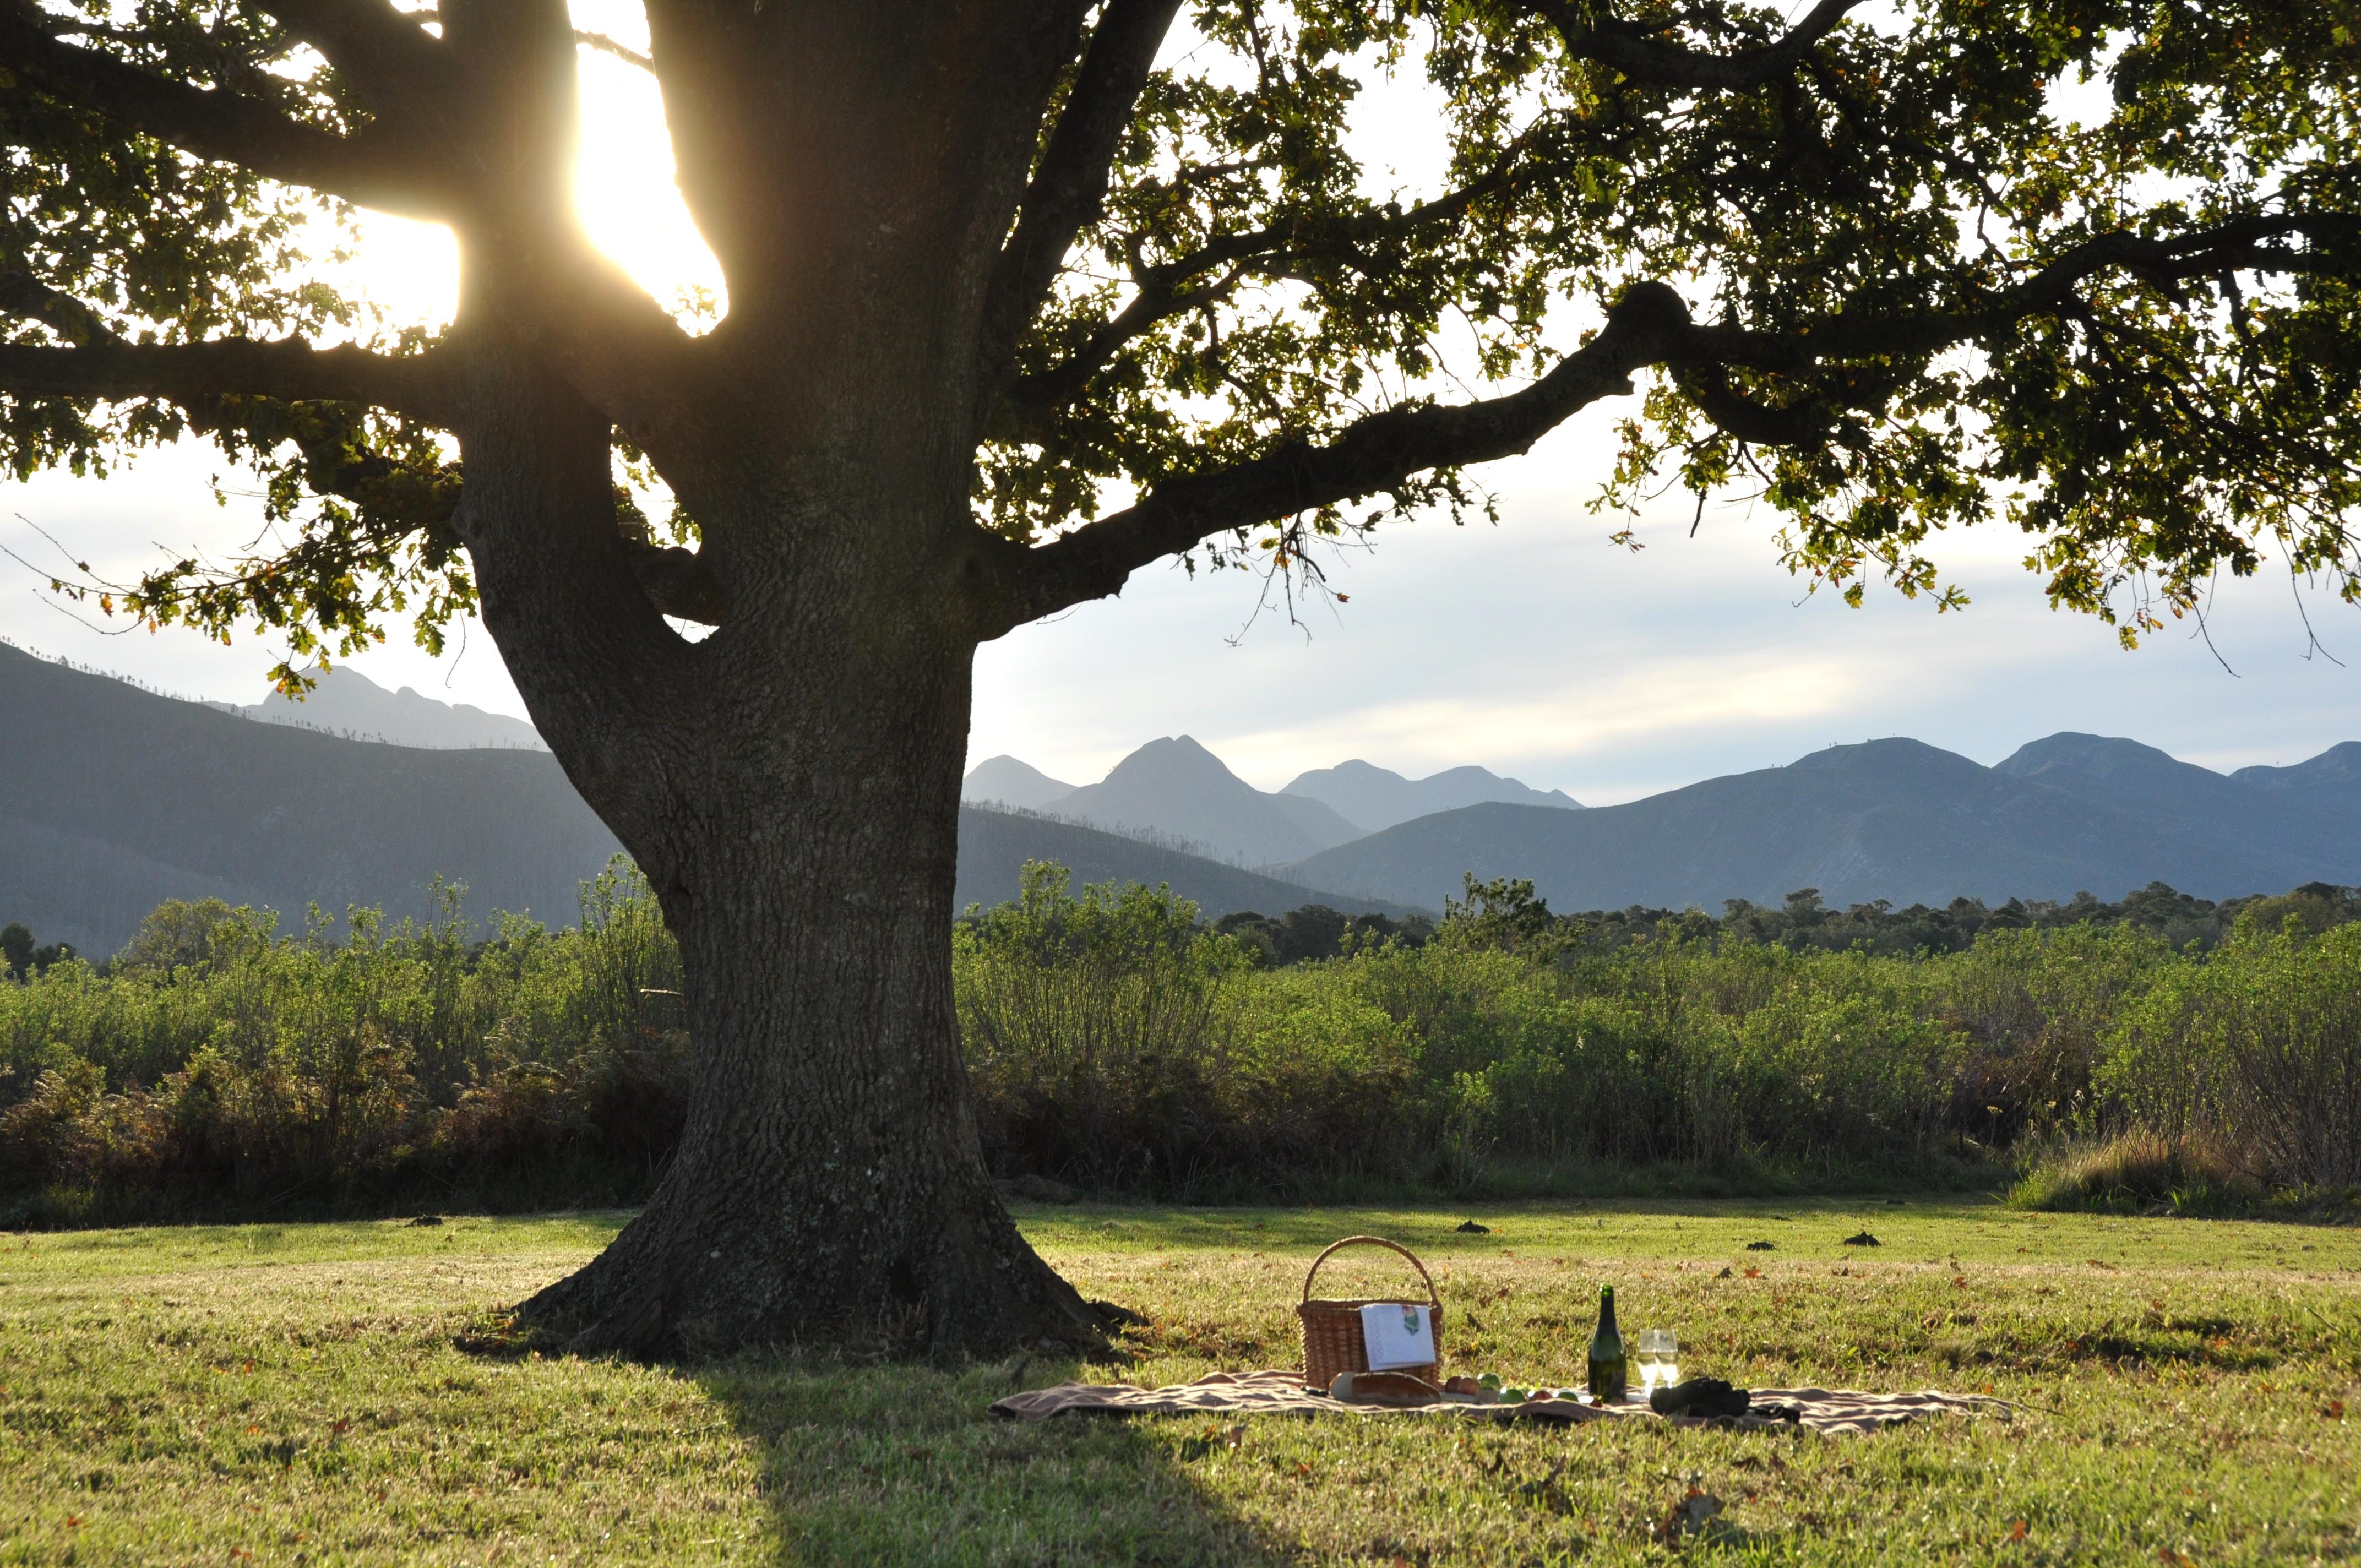 FilePlatbos Reserve Oak Tree PicnicJPG Wikimedia Commons